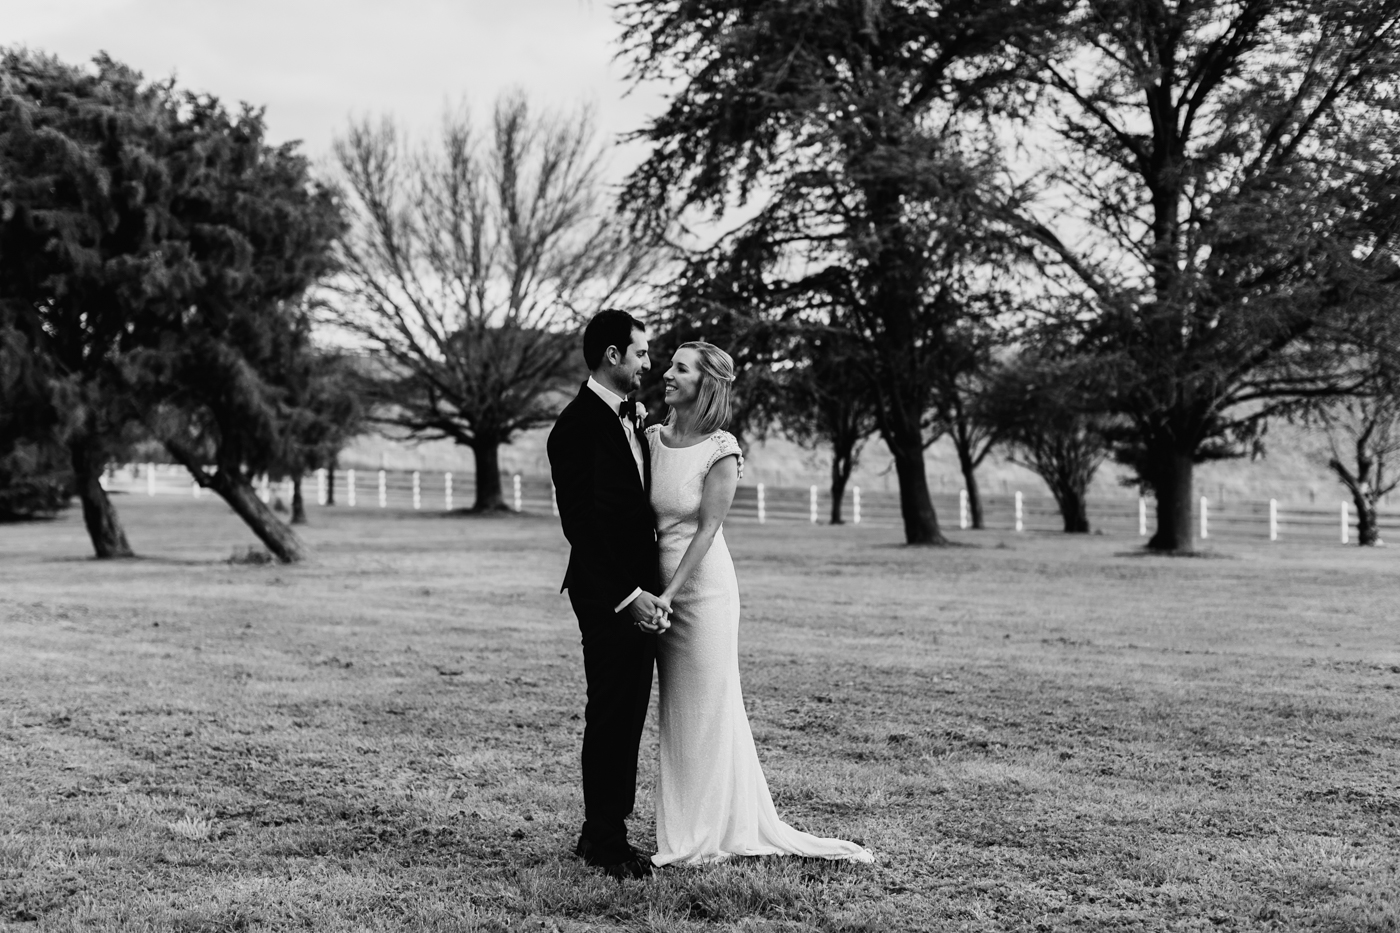 Bridget & James - Orange Country Wedding - Samantha Heather Photography-158.jpg